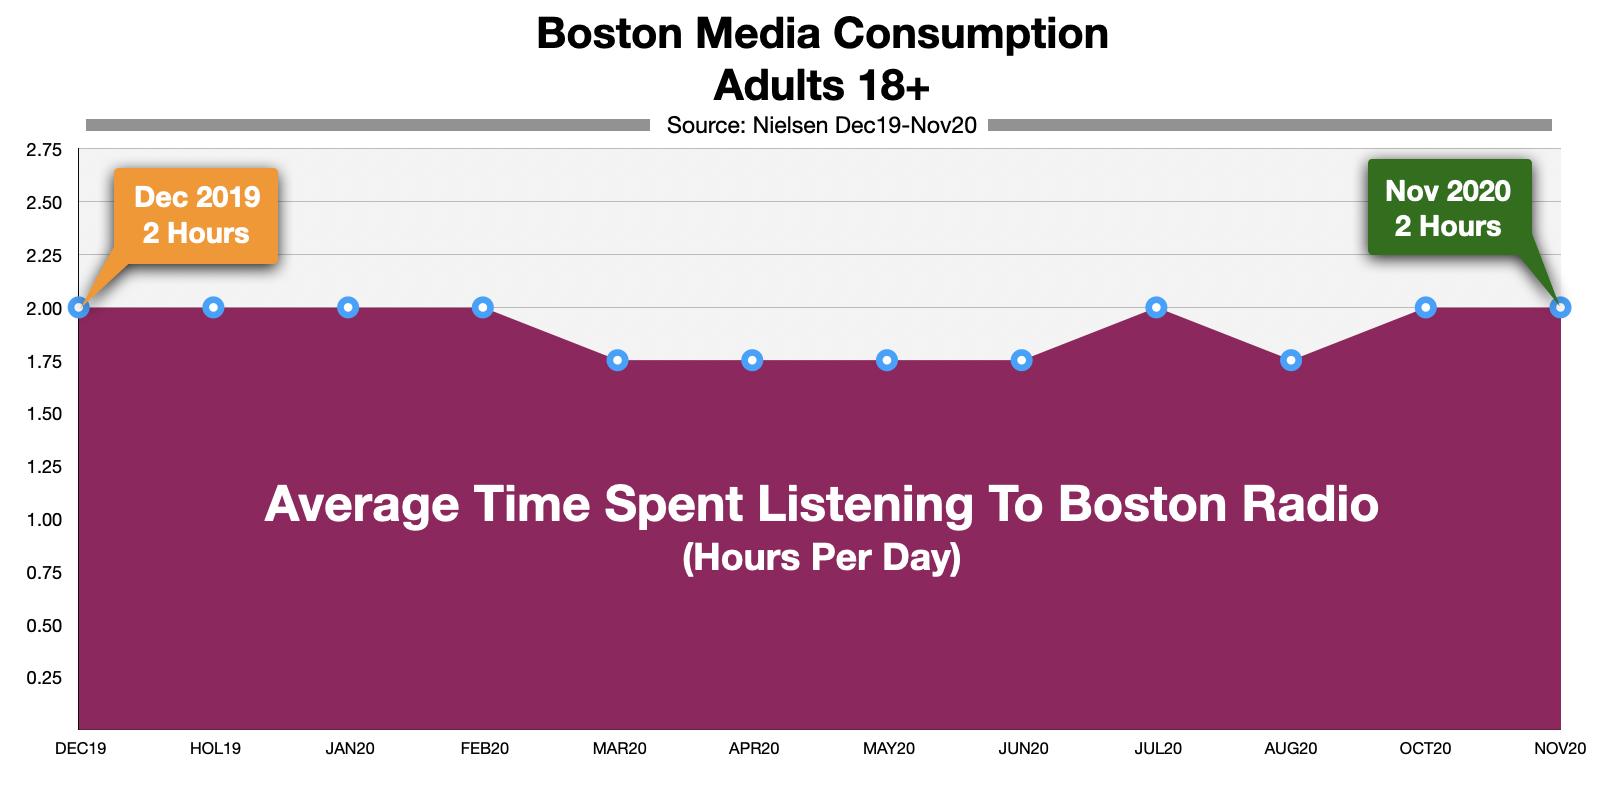 Advertising On Boston Radio Time Spent LIstening Nov 2020